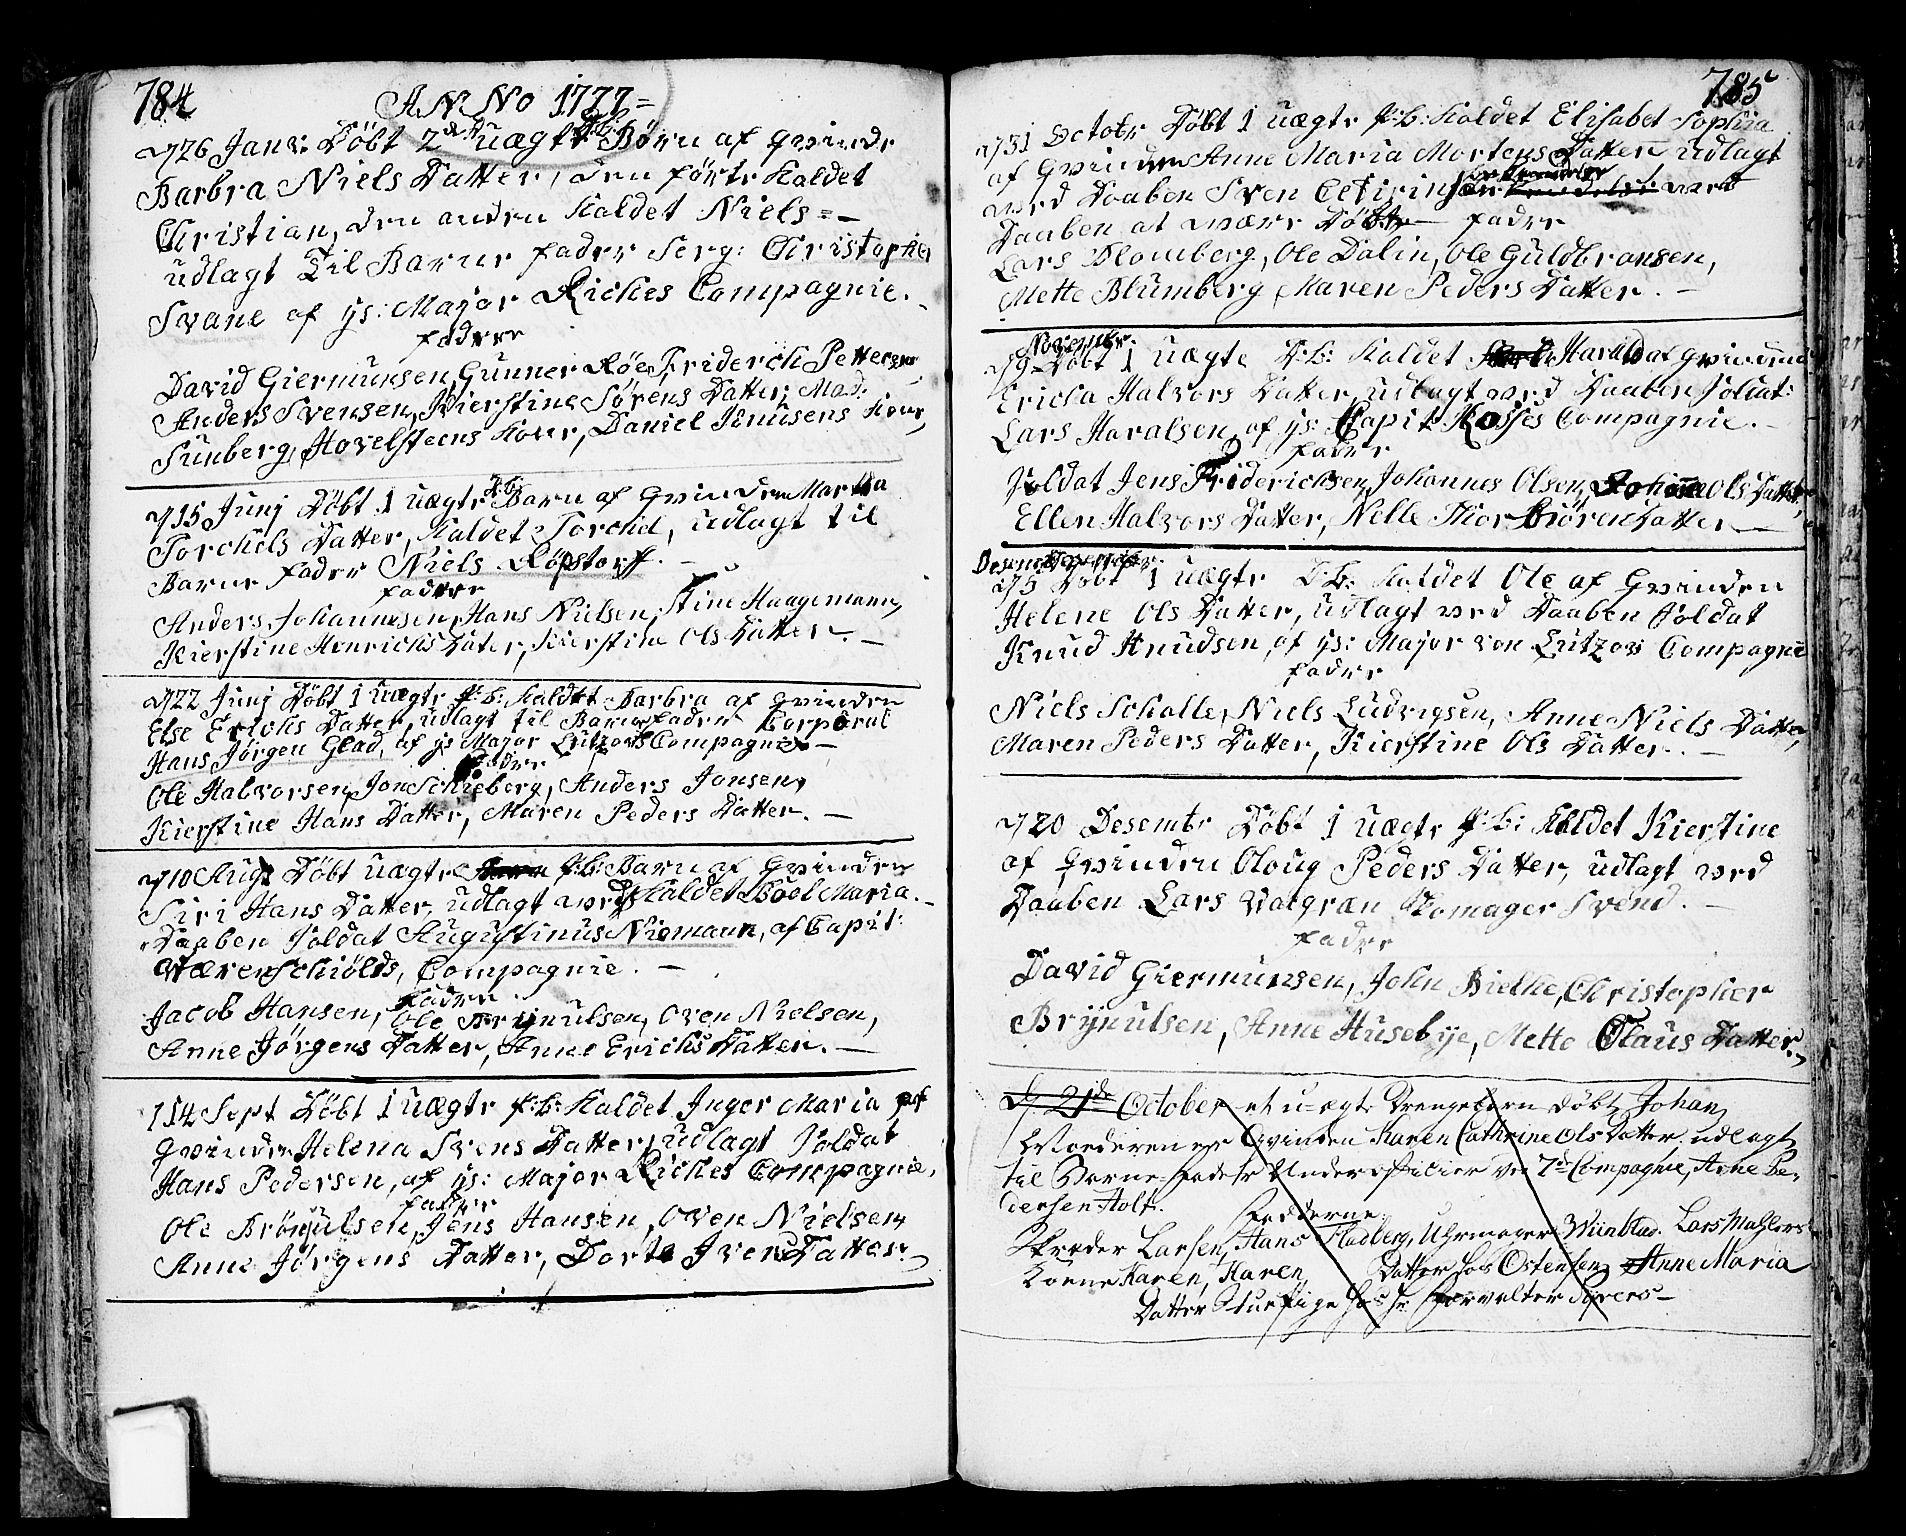 SAO, Fredrikstad prestekontor Kirkebøker, F/Fa/L0002: Ministerialbok nr. 2, 1750-1804, s. 784-785